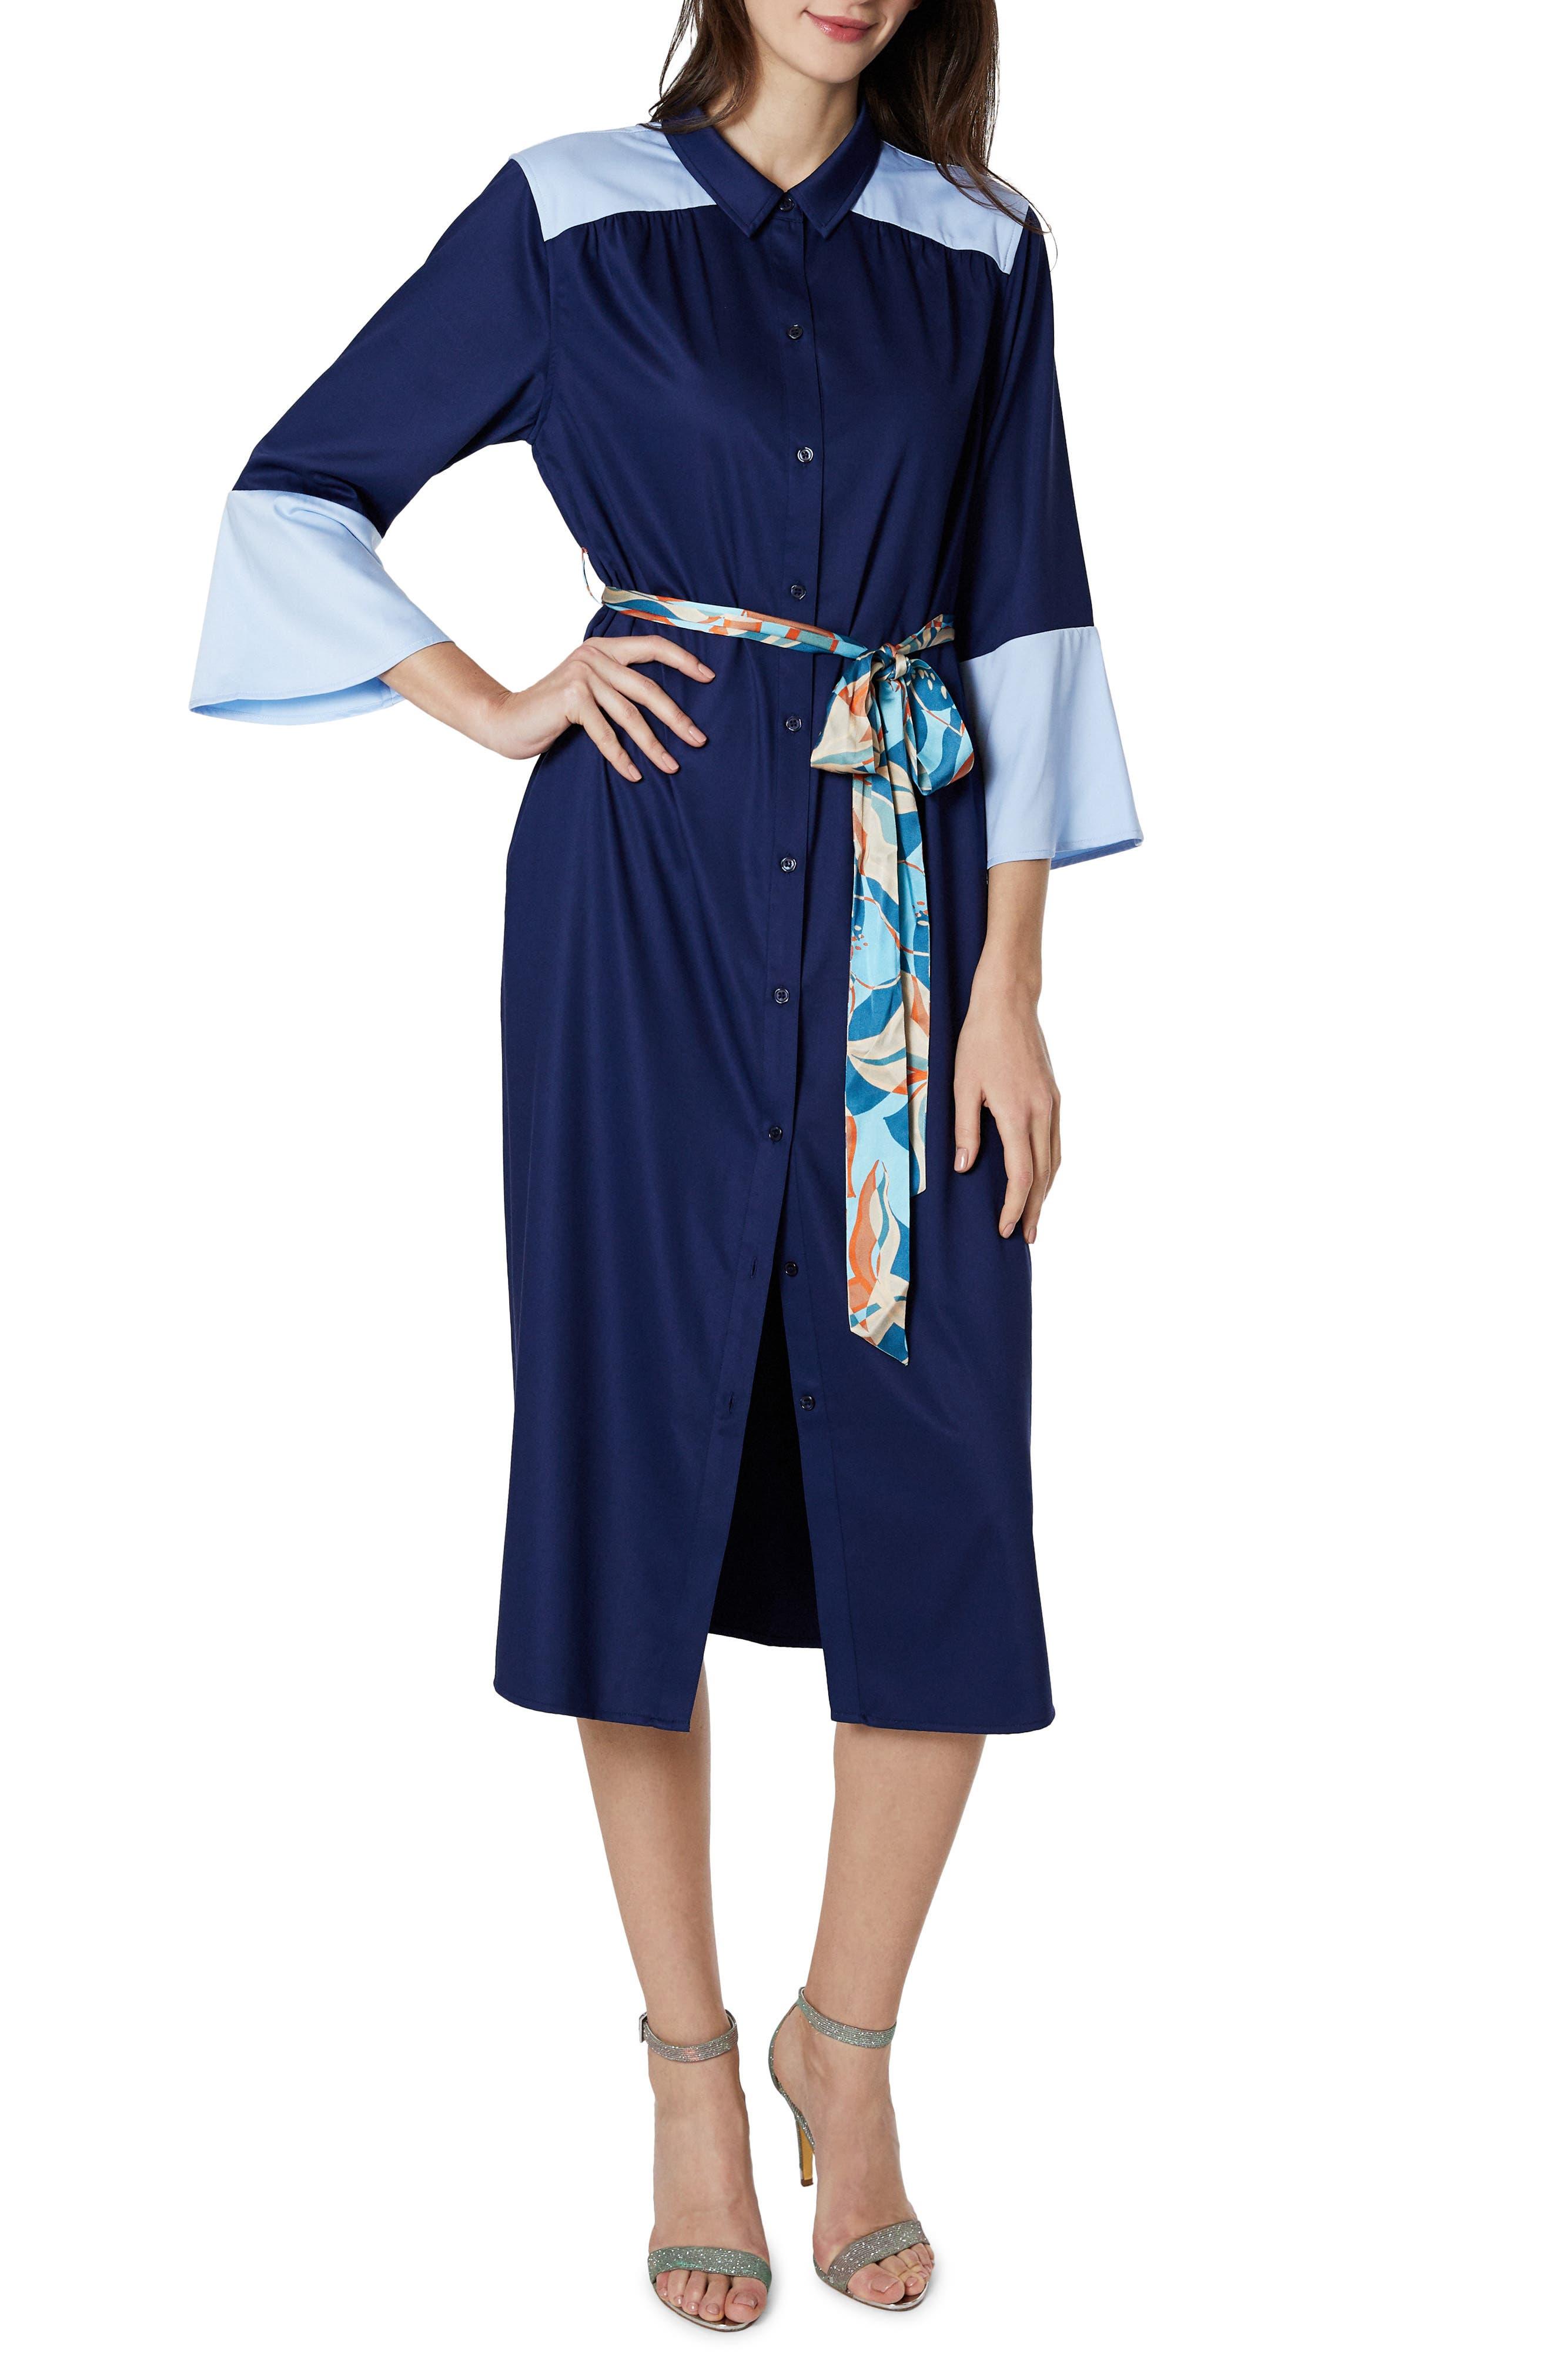 Emilia George Michelle Maternity/Nursing Dress